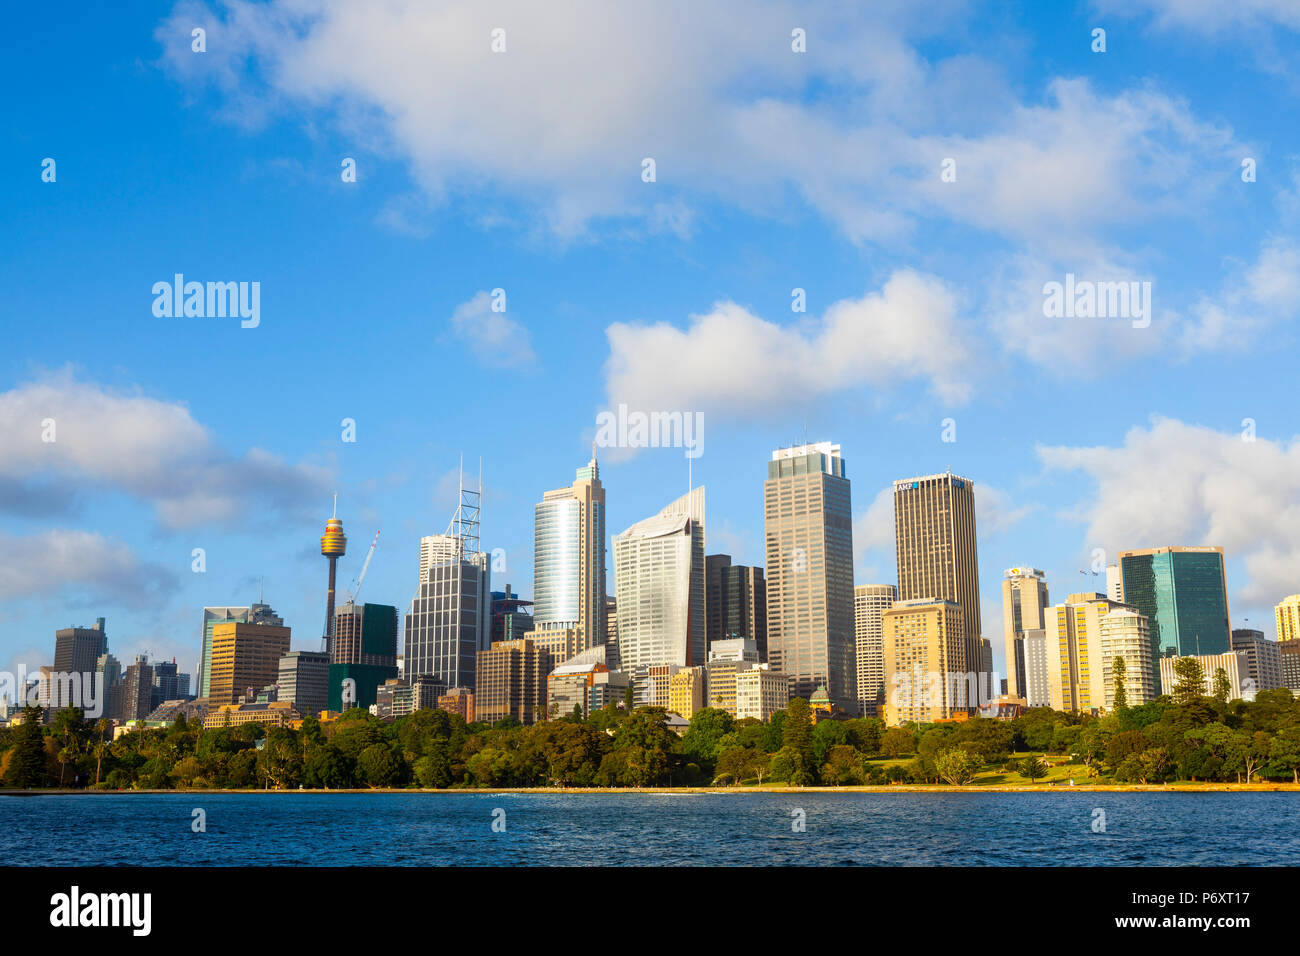 Darling Harbour, Sydney, New South Wales, Australien Stockbild